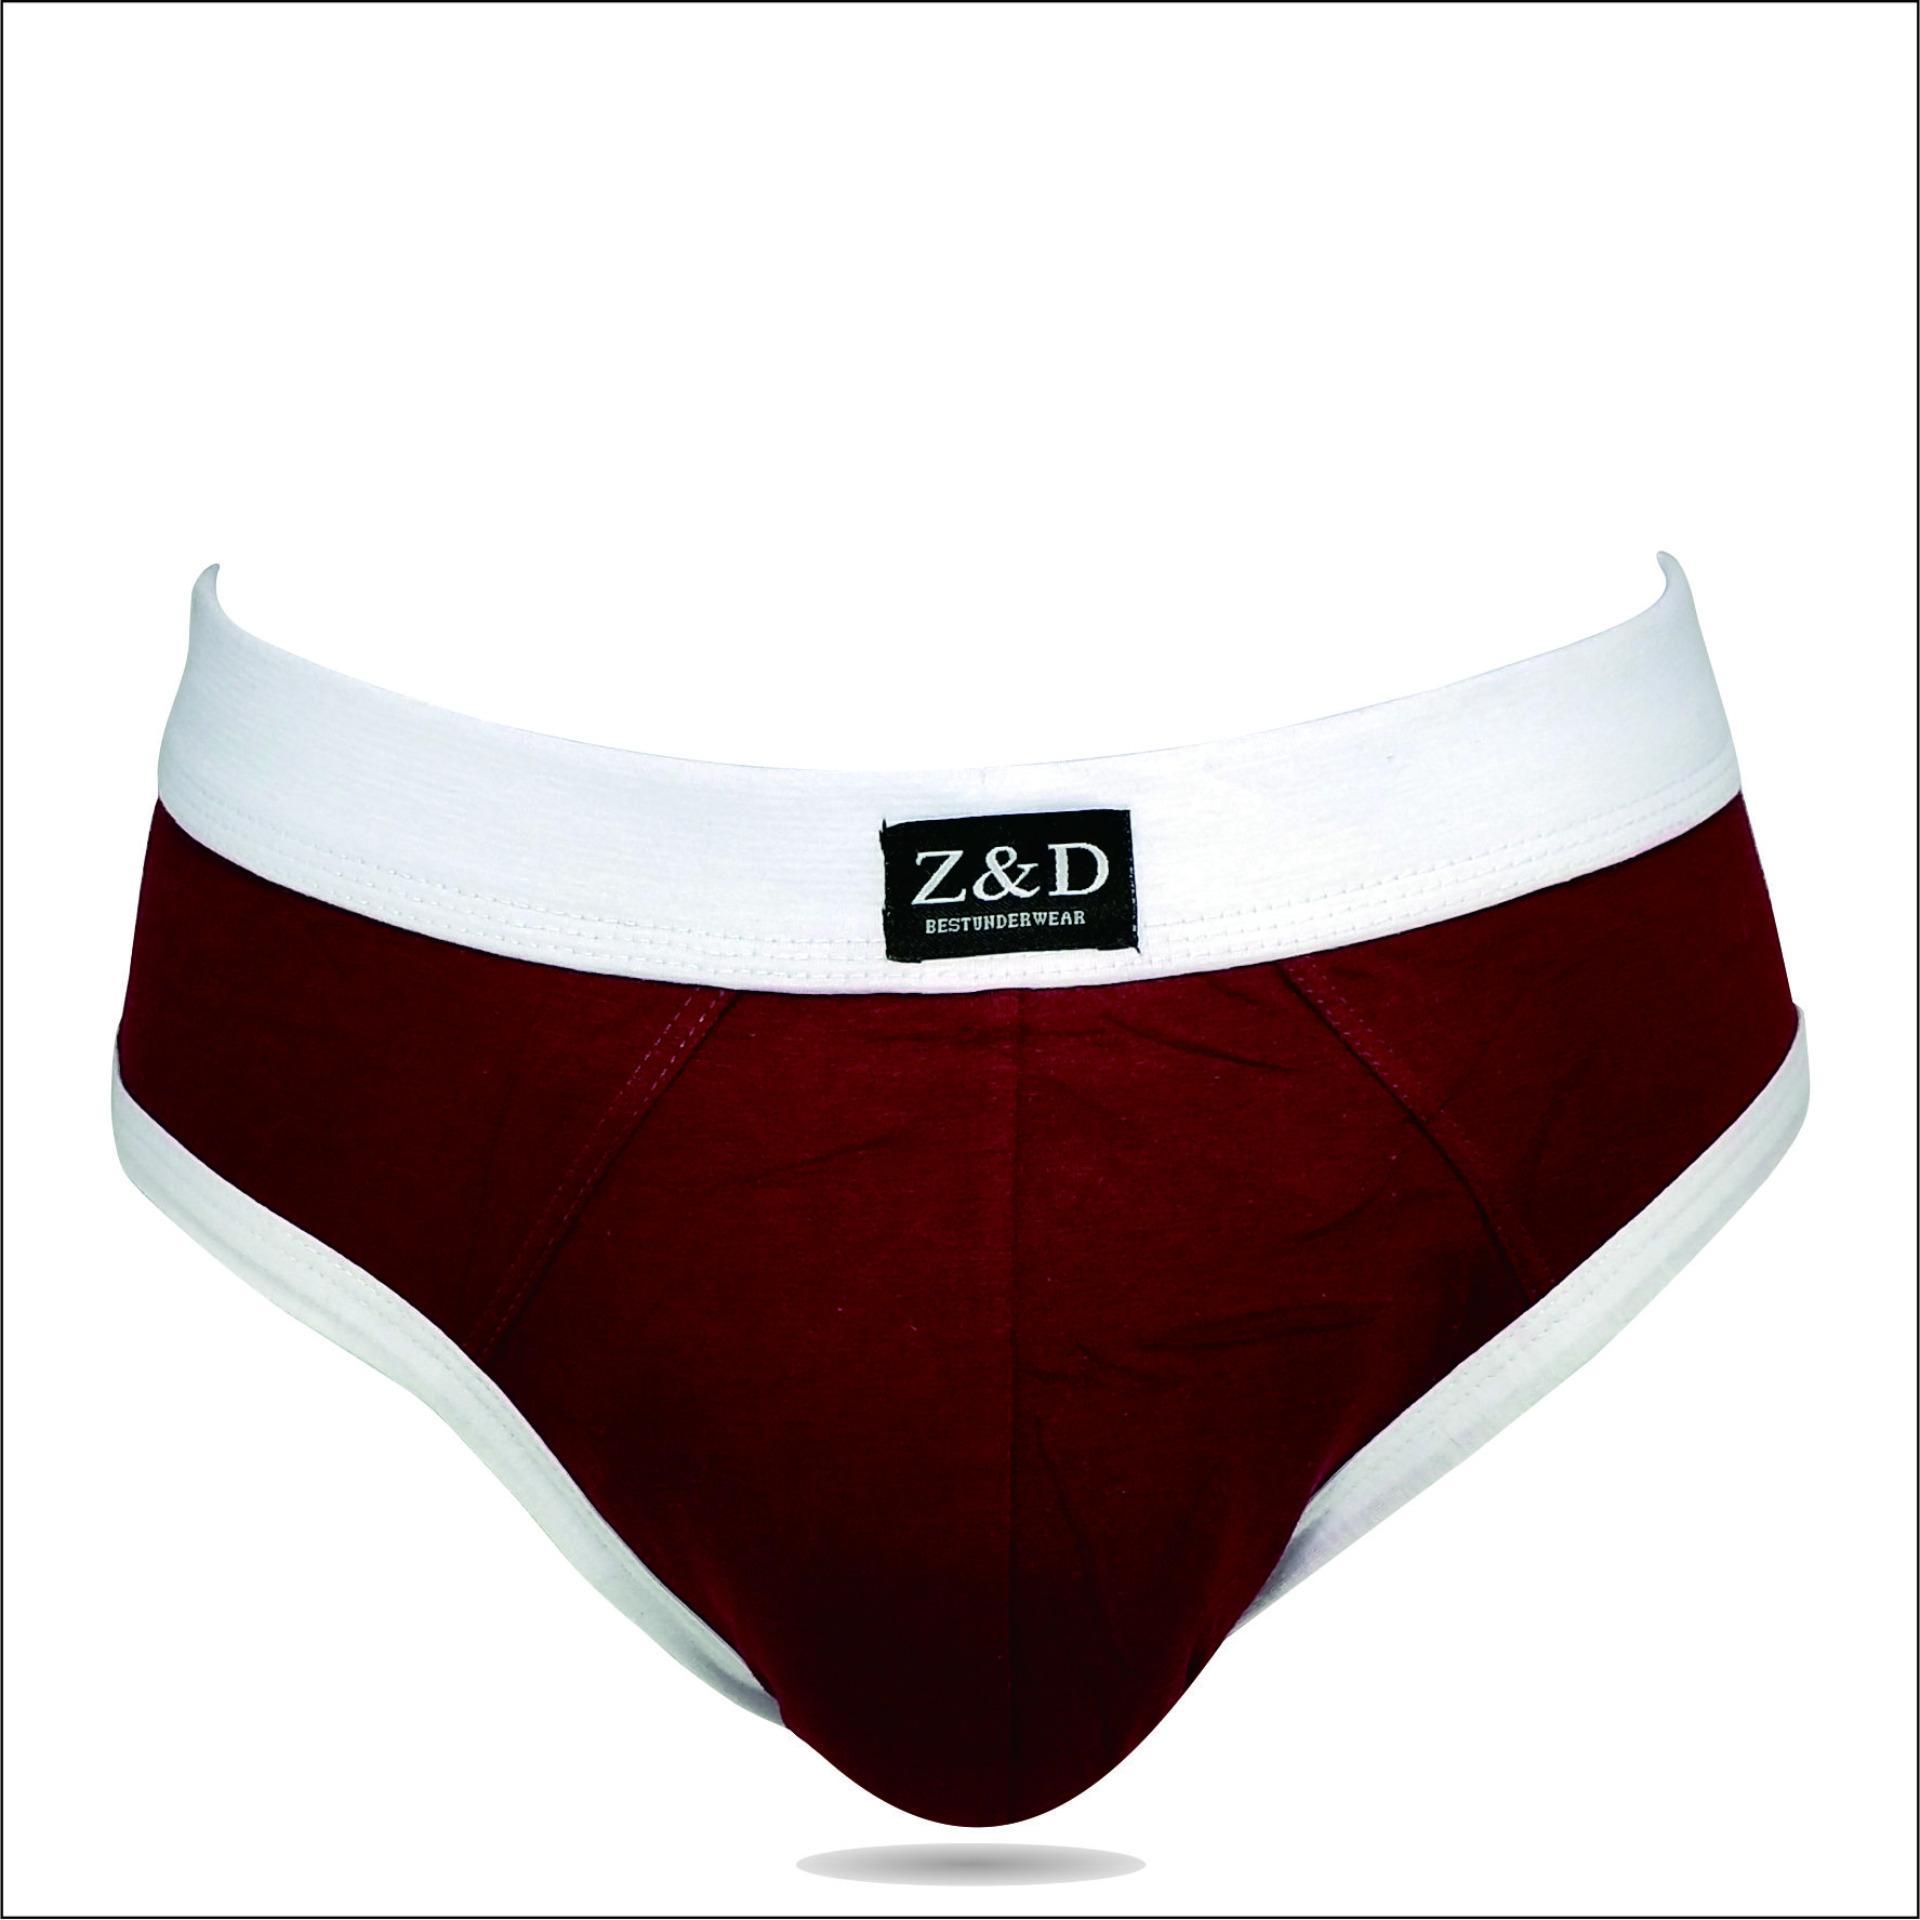 Aiueo Vakoou Underwear Celana Keperkasaan Size Xxl Dalam Usa Man Magnetic Source Weitech Pria Model Brief Bahan